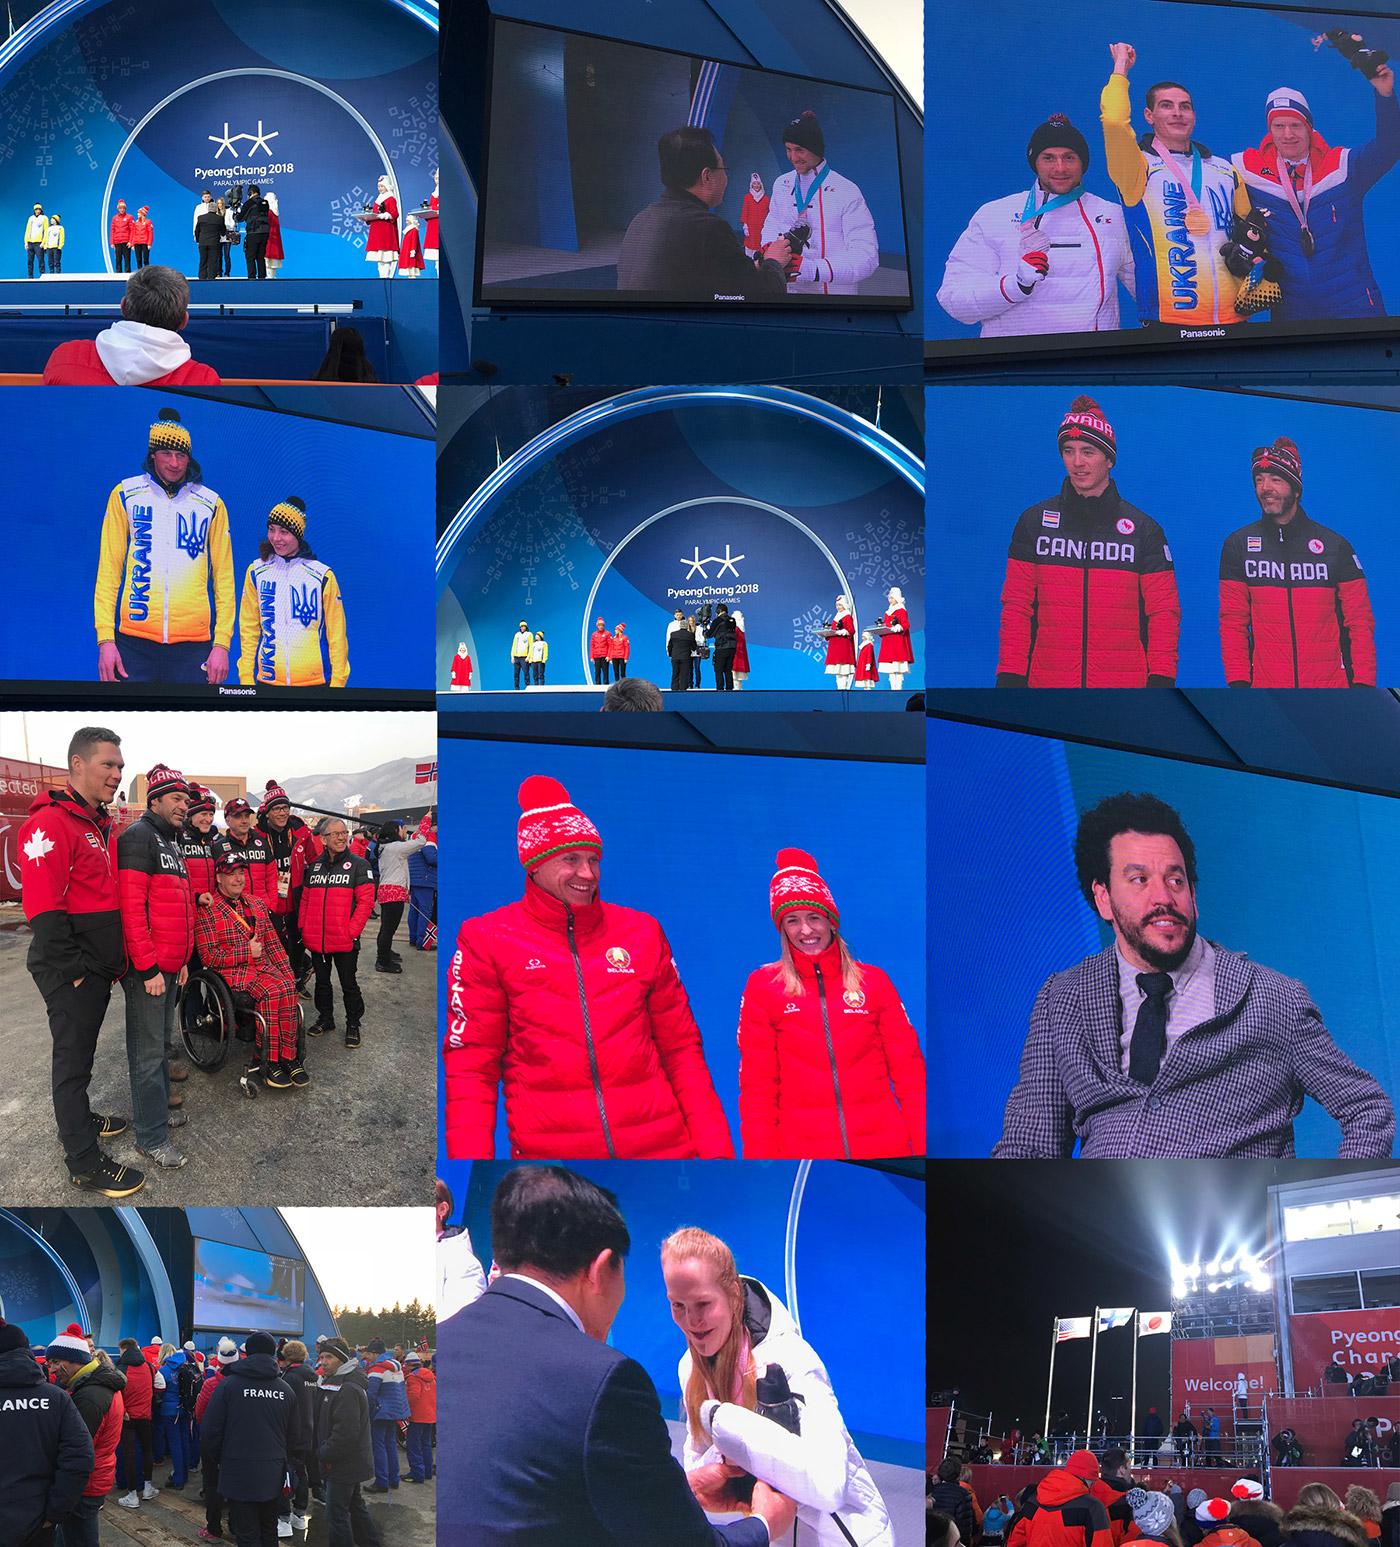 PyeongChang Paralympics 2018 Photo Montage 8 - Paralympic Medal Plaza